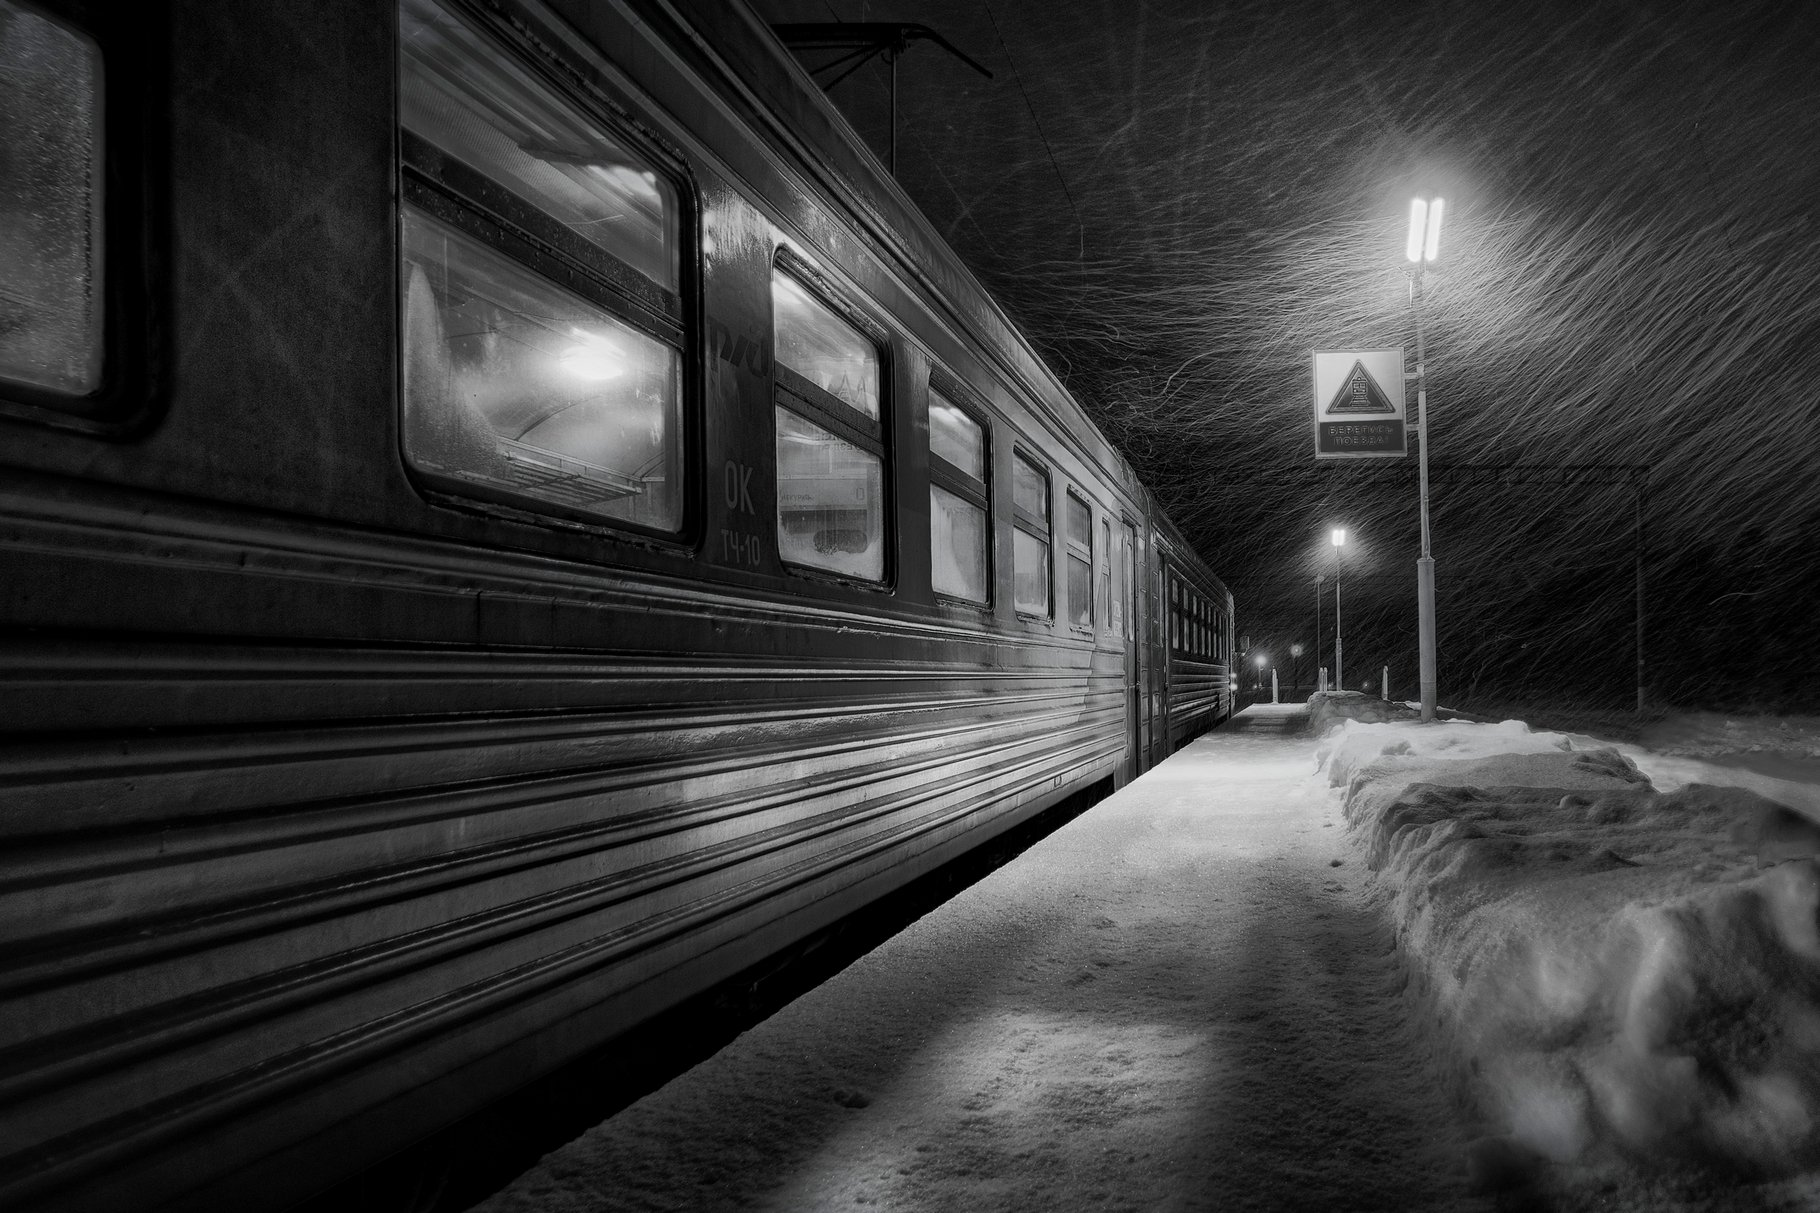 утро,метель,станция,электричка,зима,вагон, Тамара